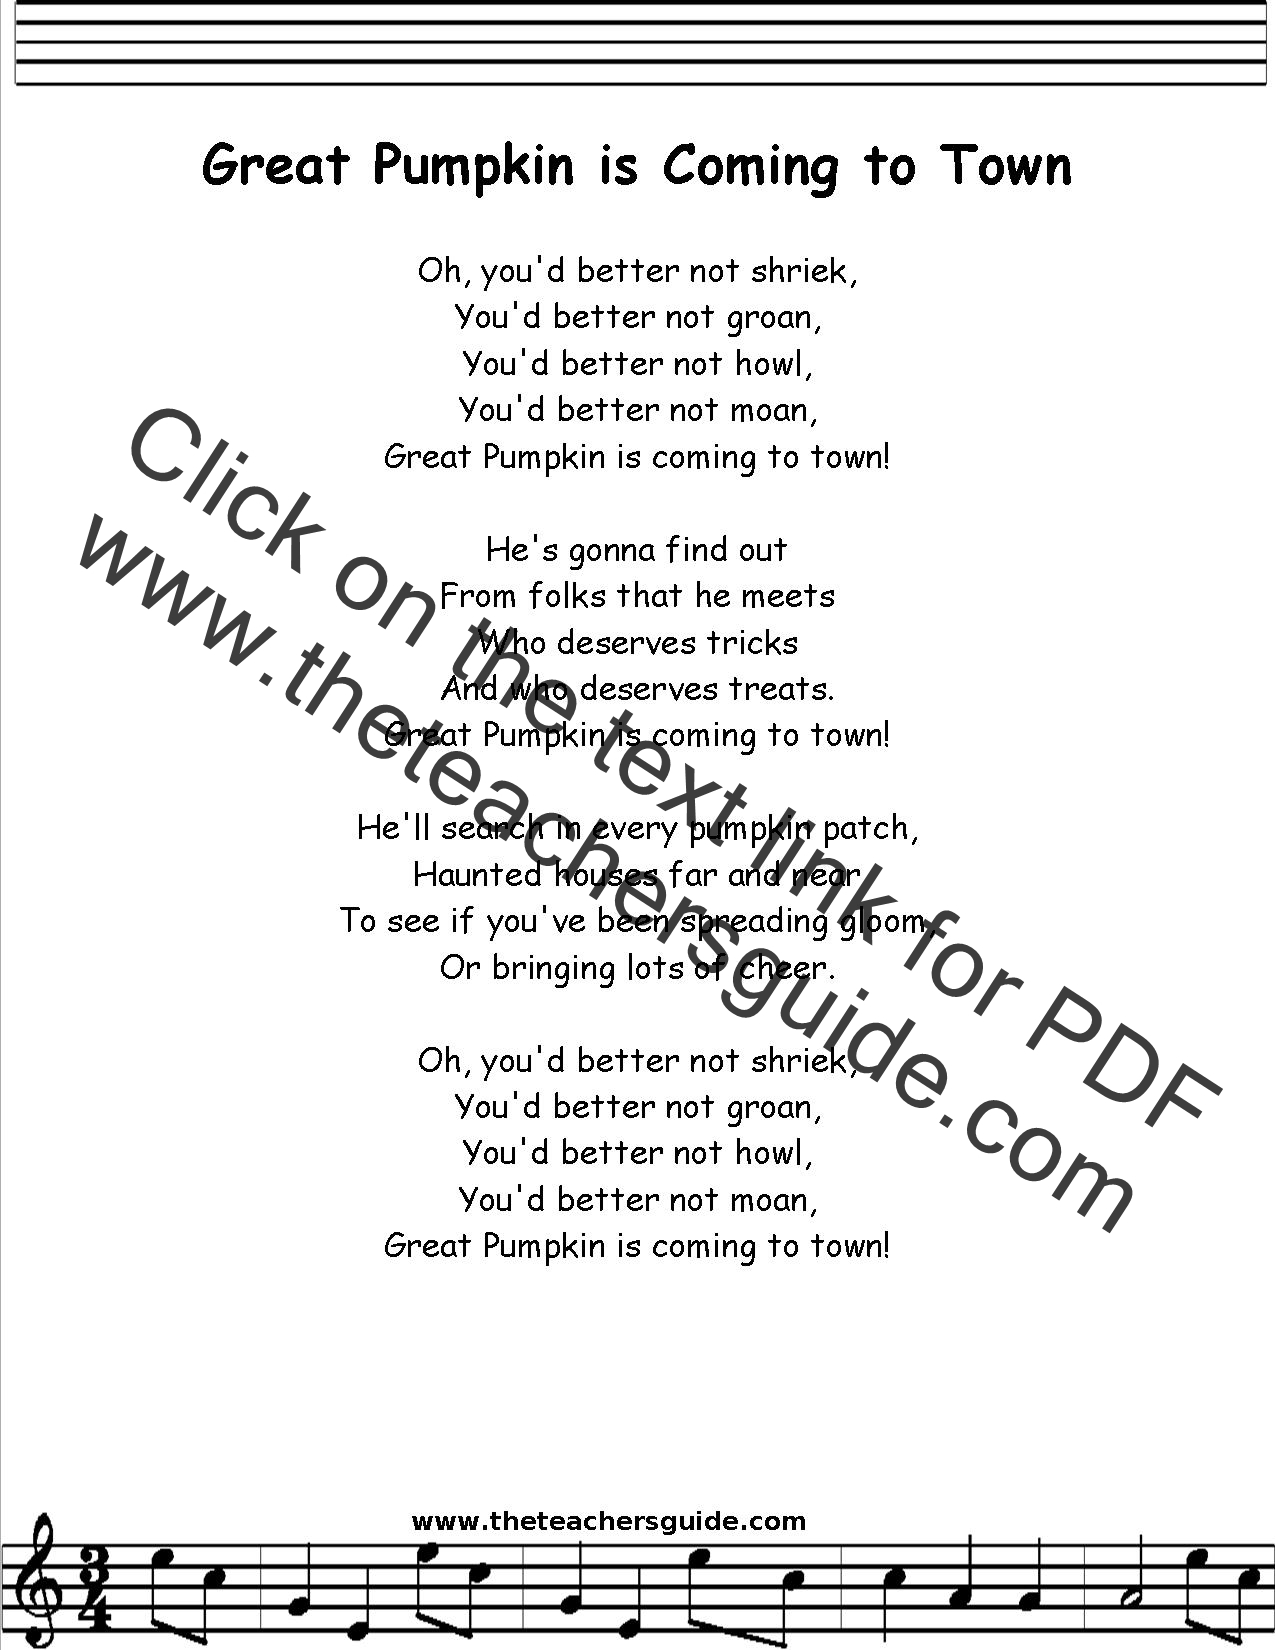 great pumpkin lyrics printout